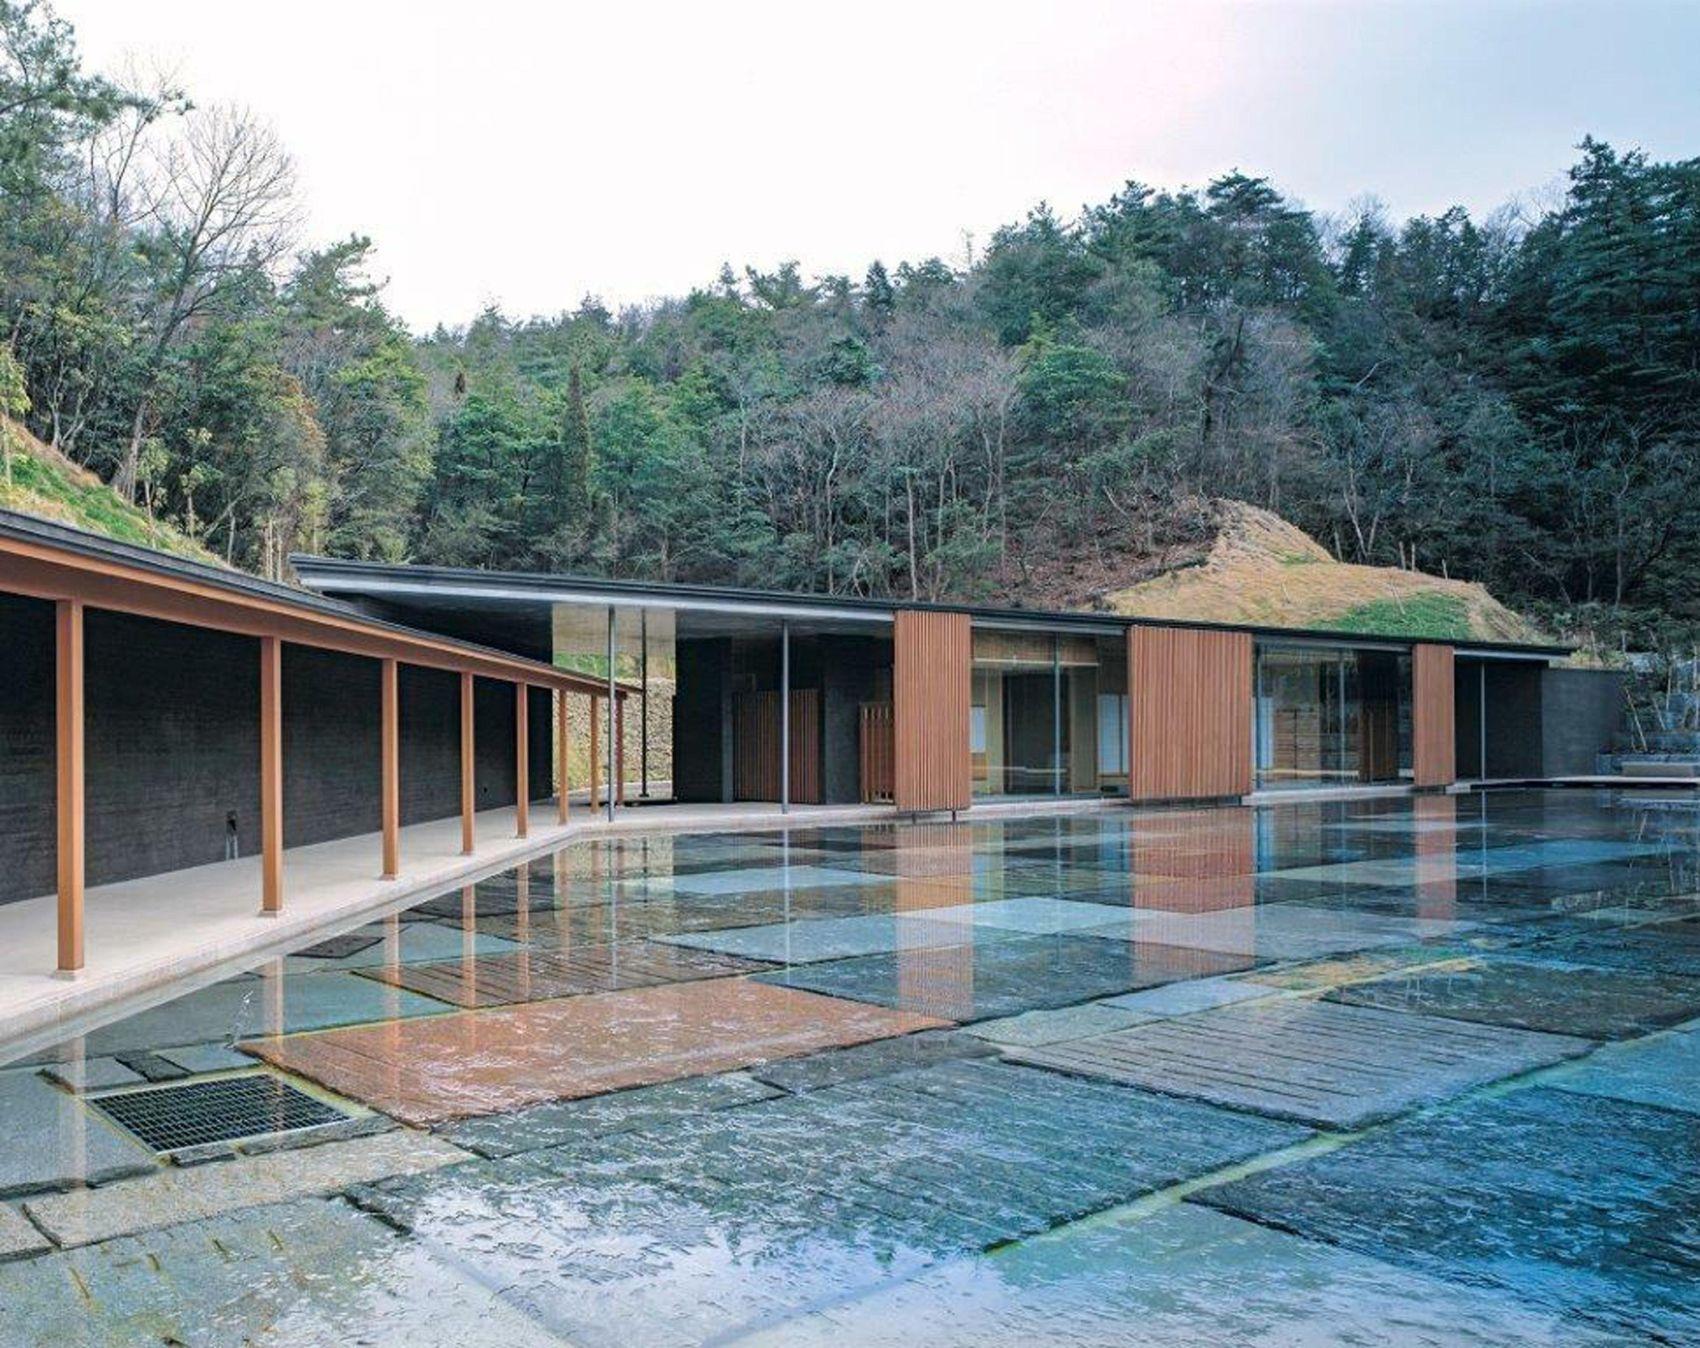 Japan Arata Isozaki Pritzker Prize 2019 004